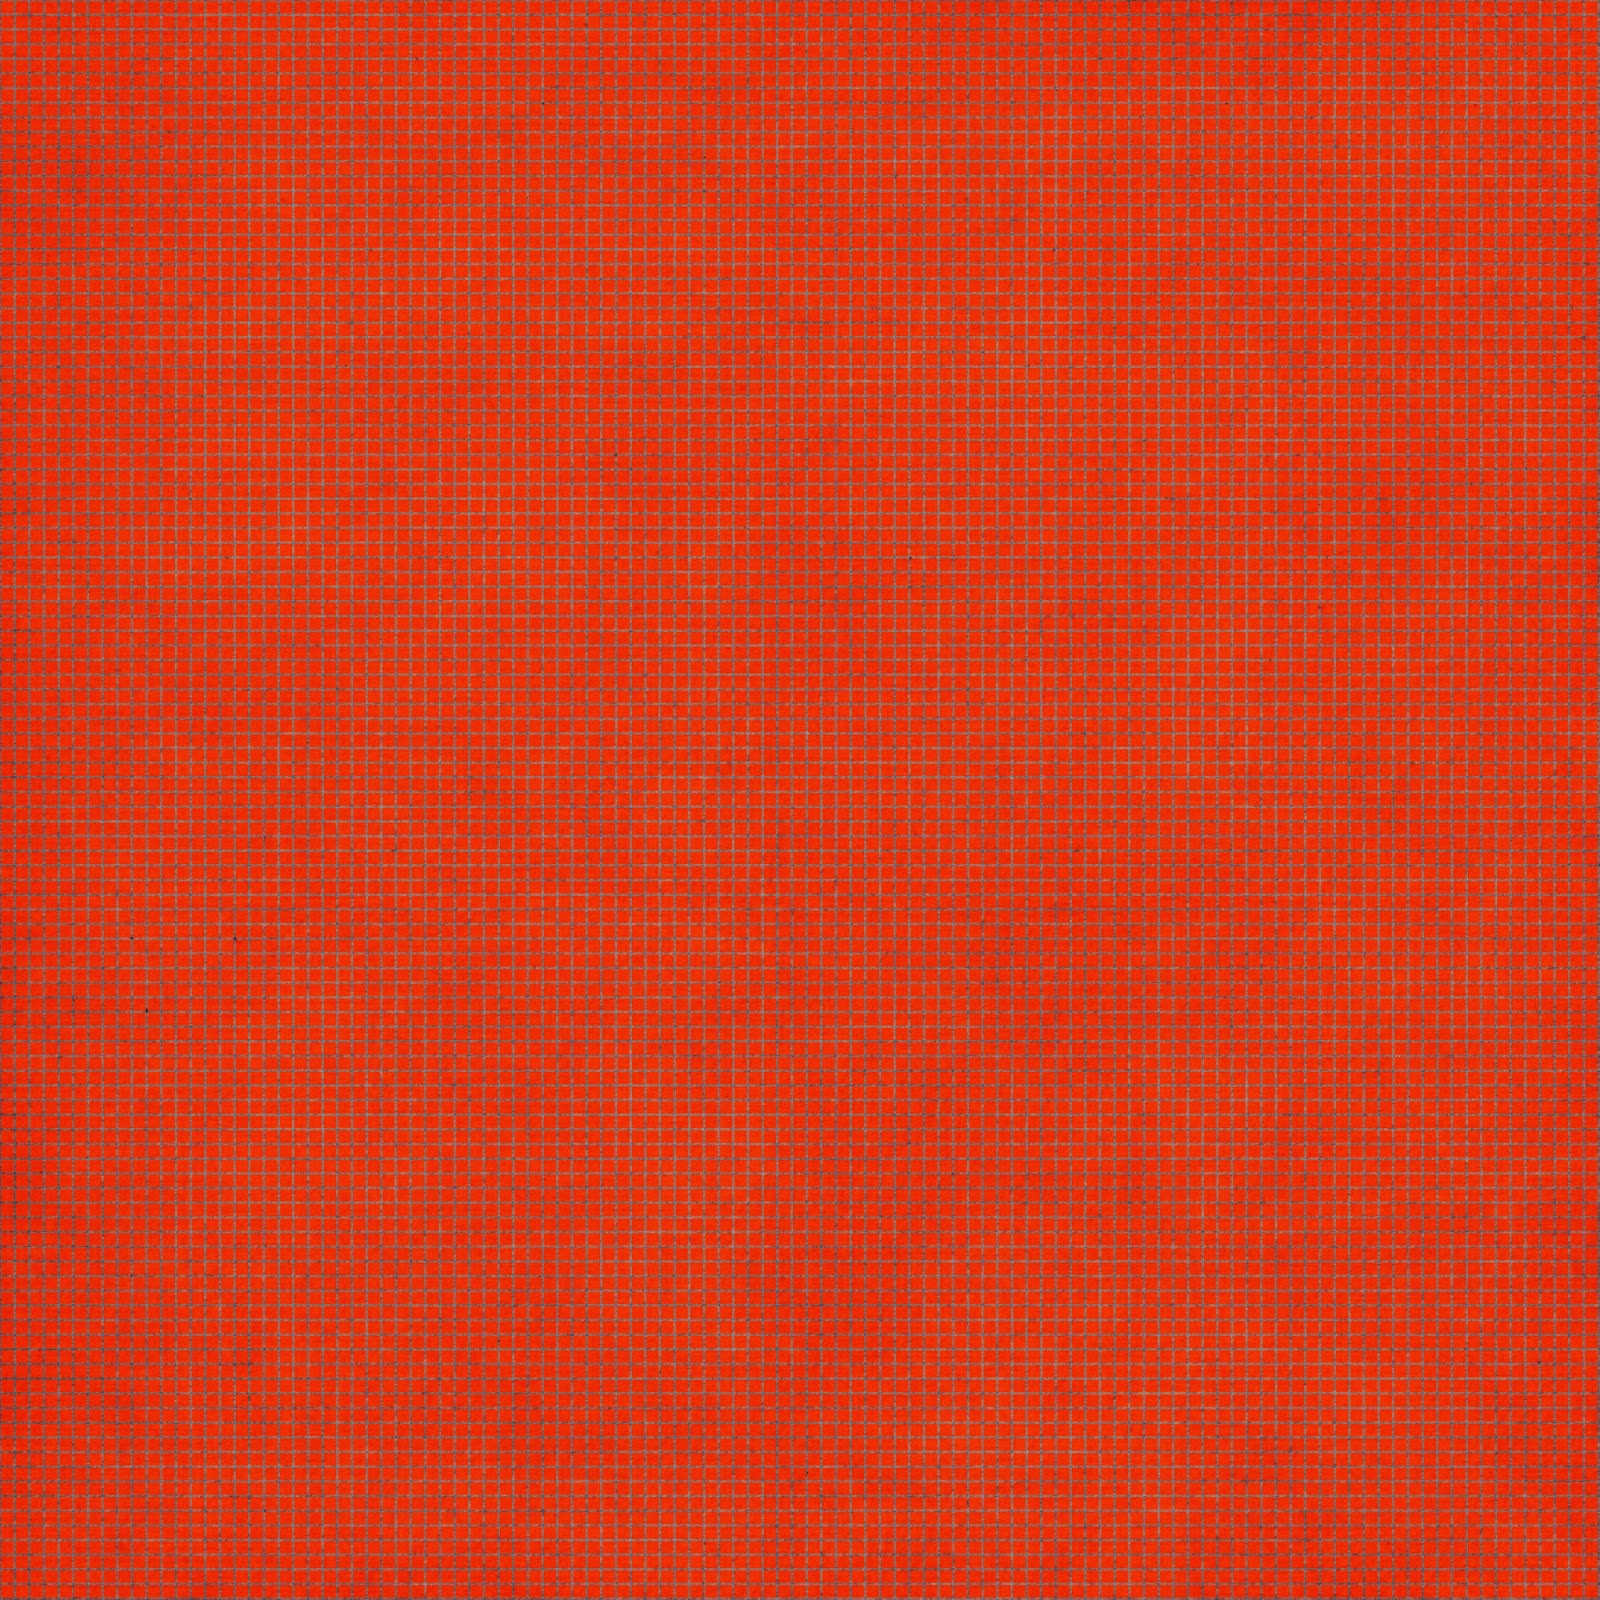 Fondo Rojo Tipo Cómic.